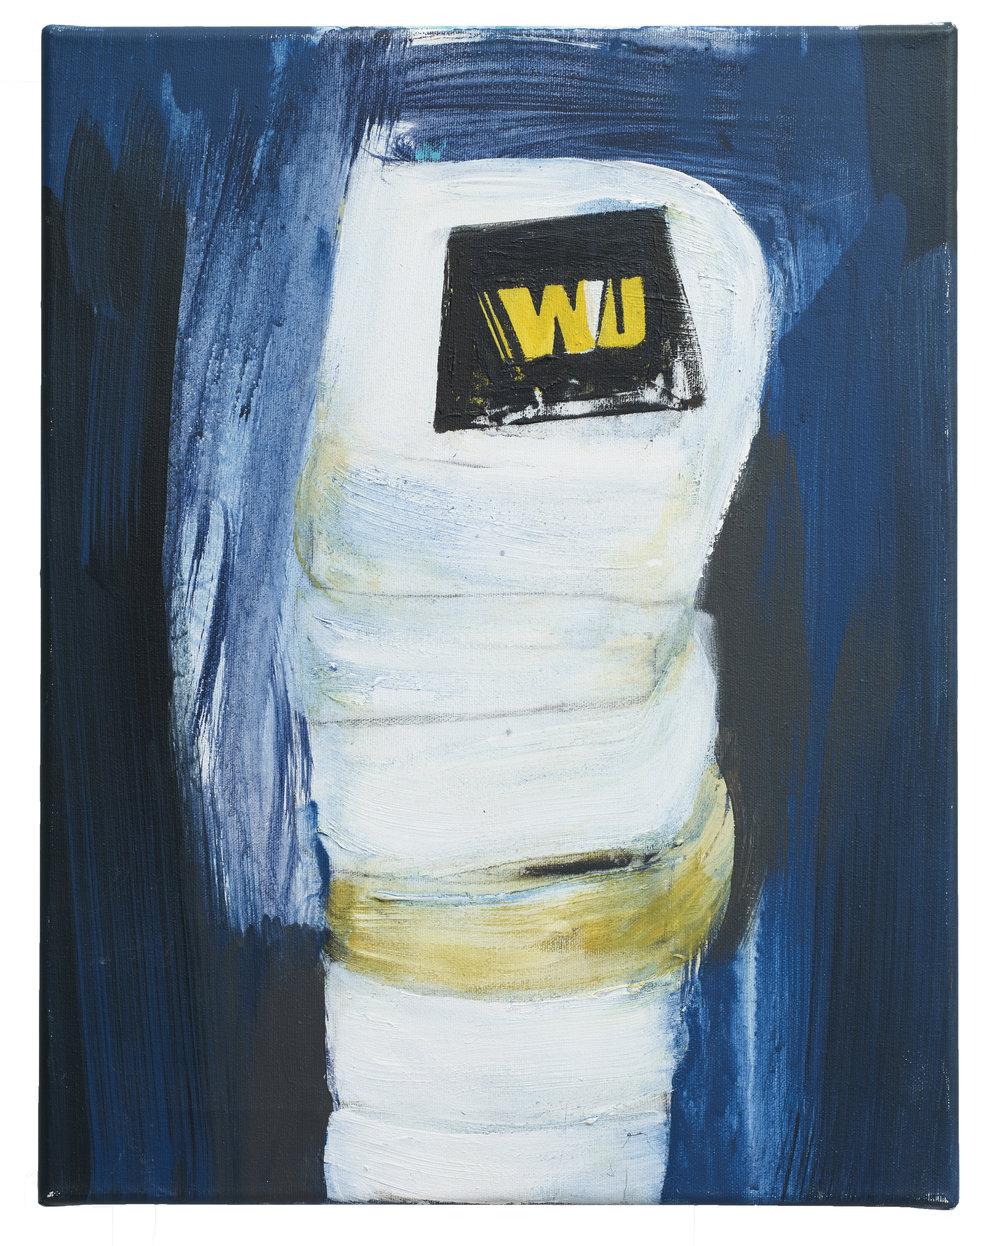 Brian Maguire  Cocaine Laundry Series, WU , 2016 Acrylic on canvas 46 x 35.5 cm